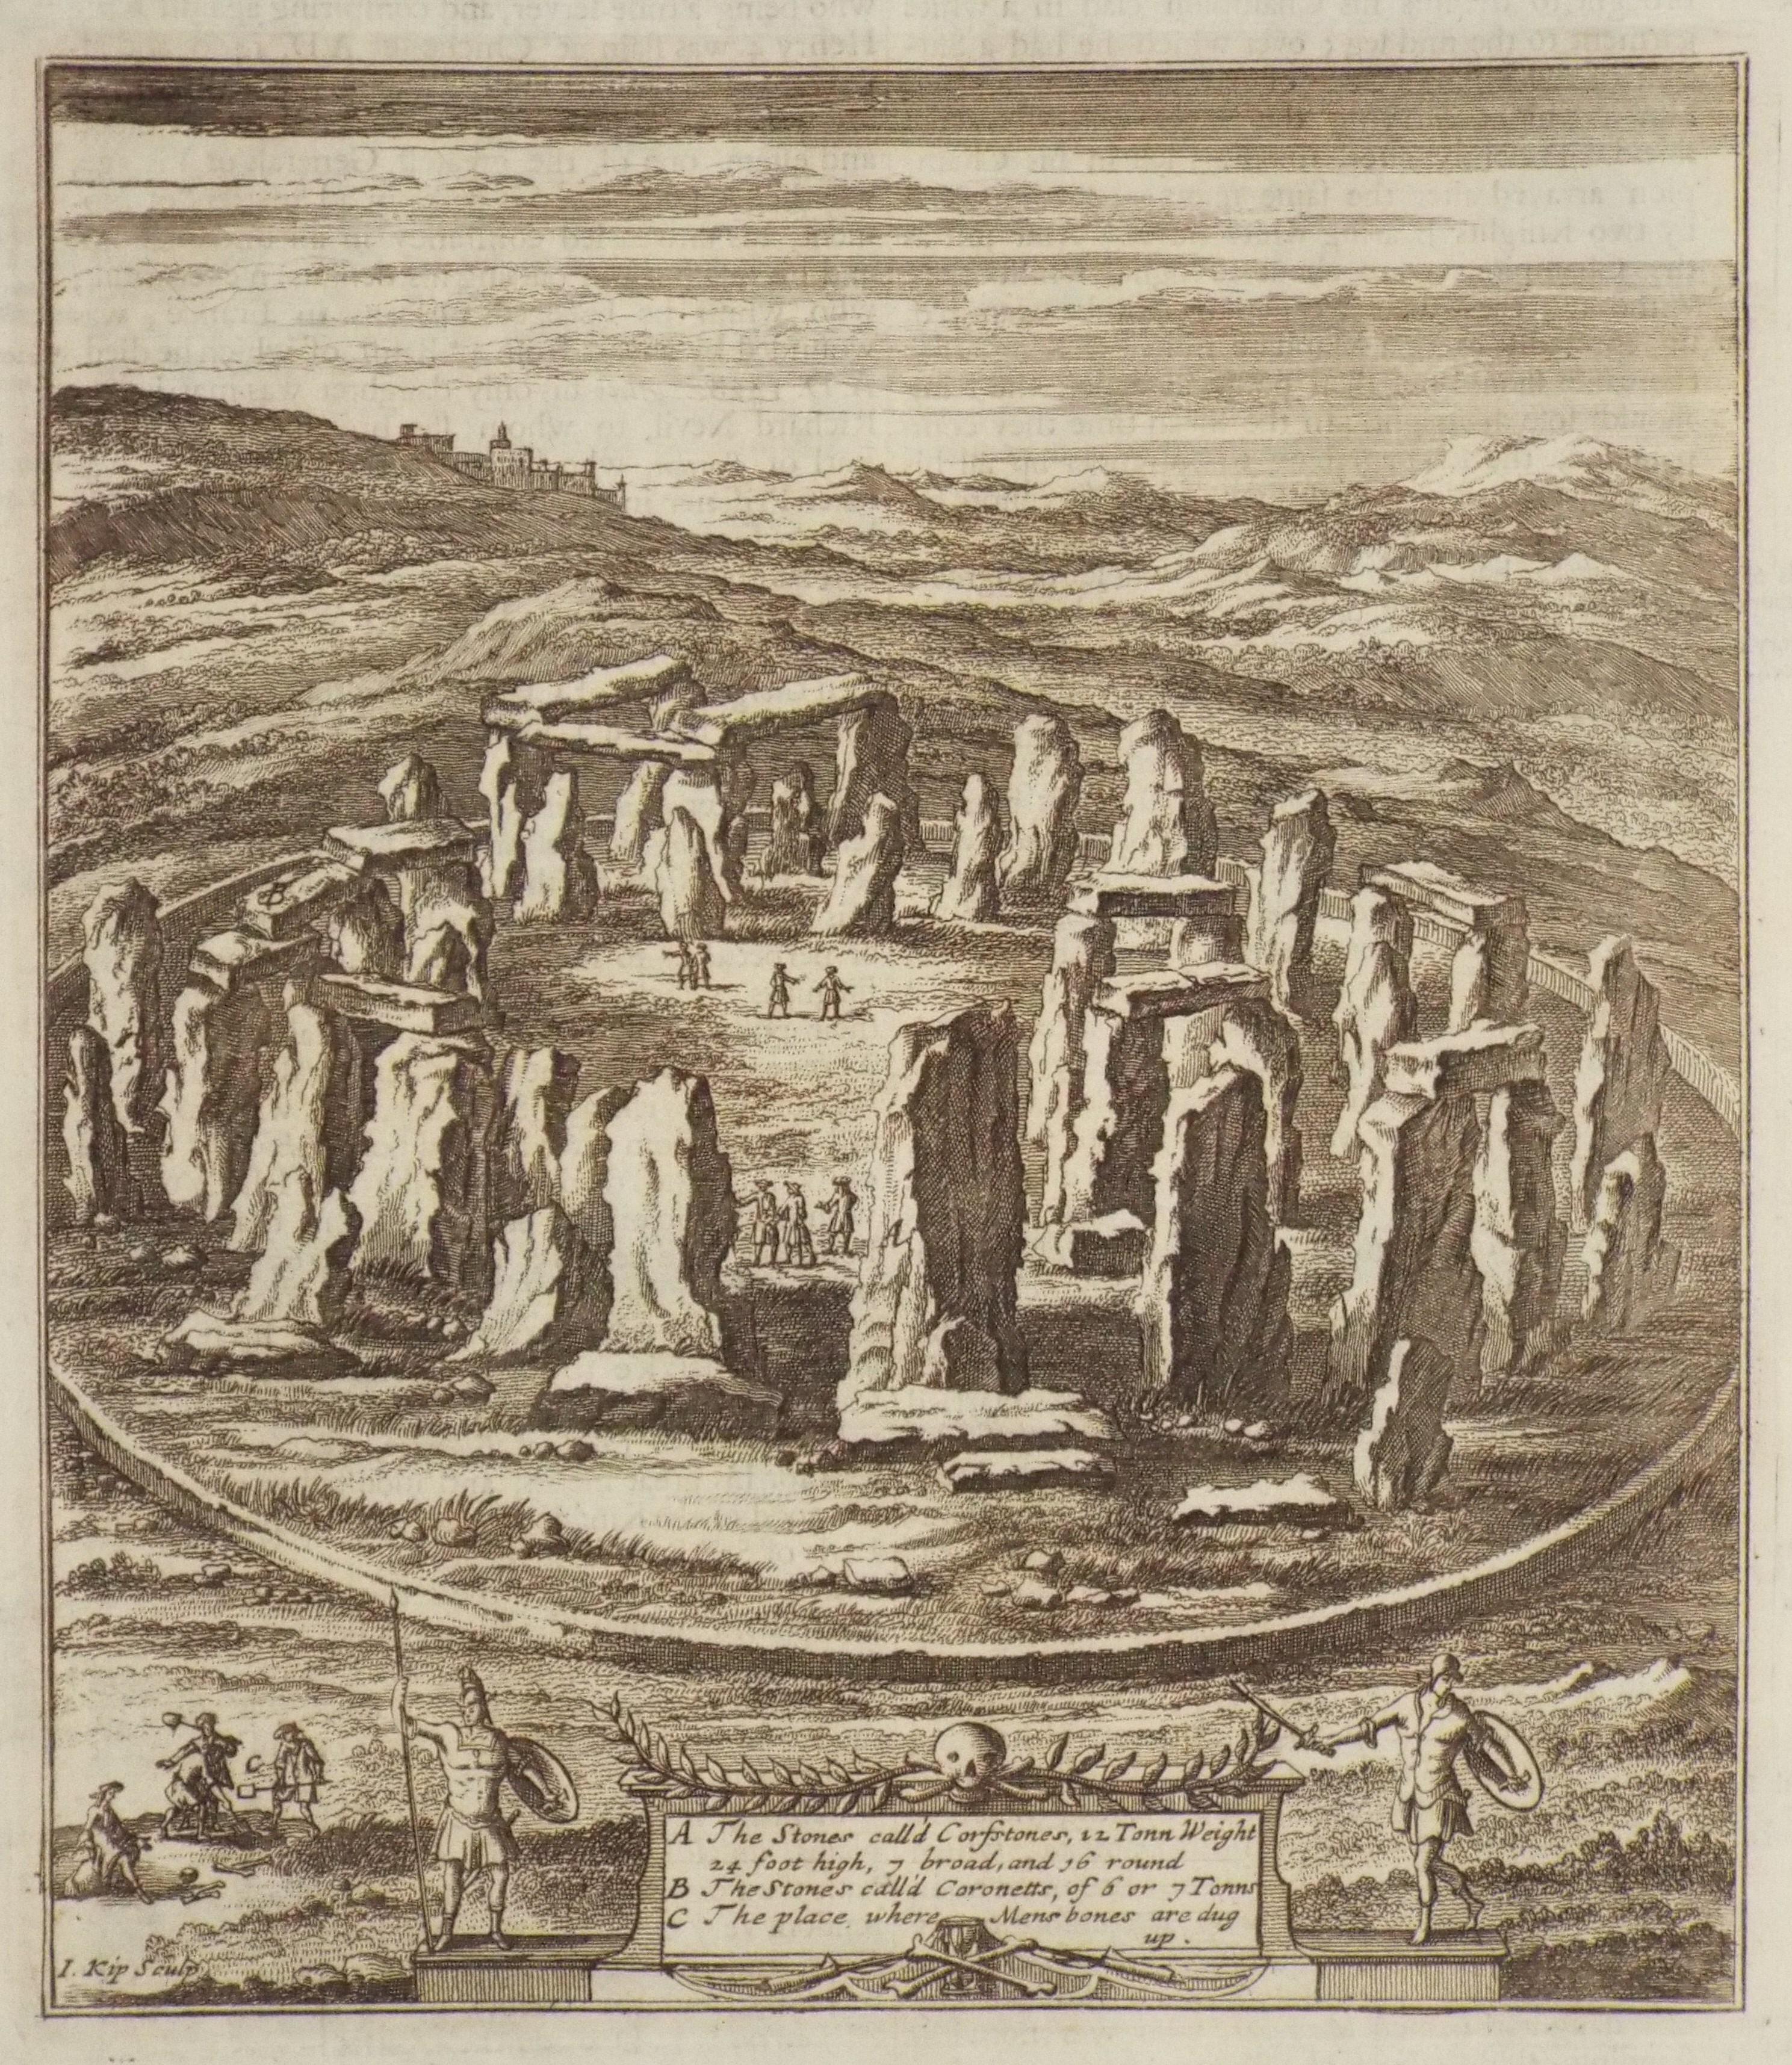 The West Riding of York Shire Ref: P/16495. Medium: Copper Artist: Morden R  Publisher: Abel Swale Awnsham & John Churchill Date: 1695 .